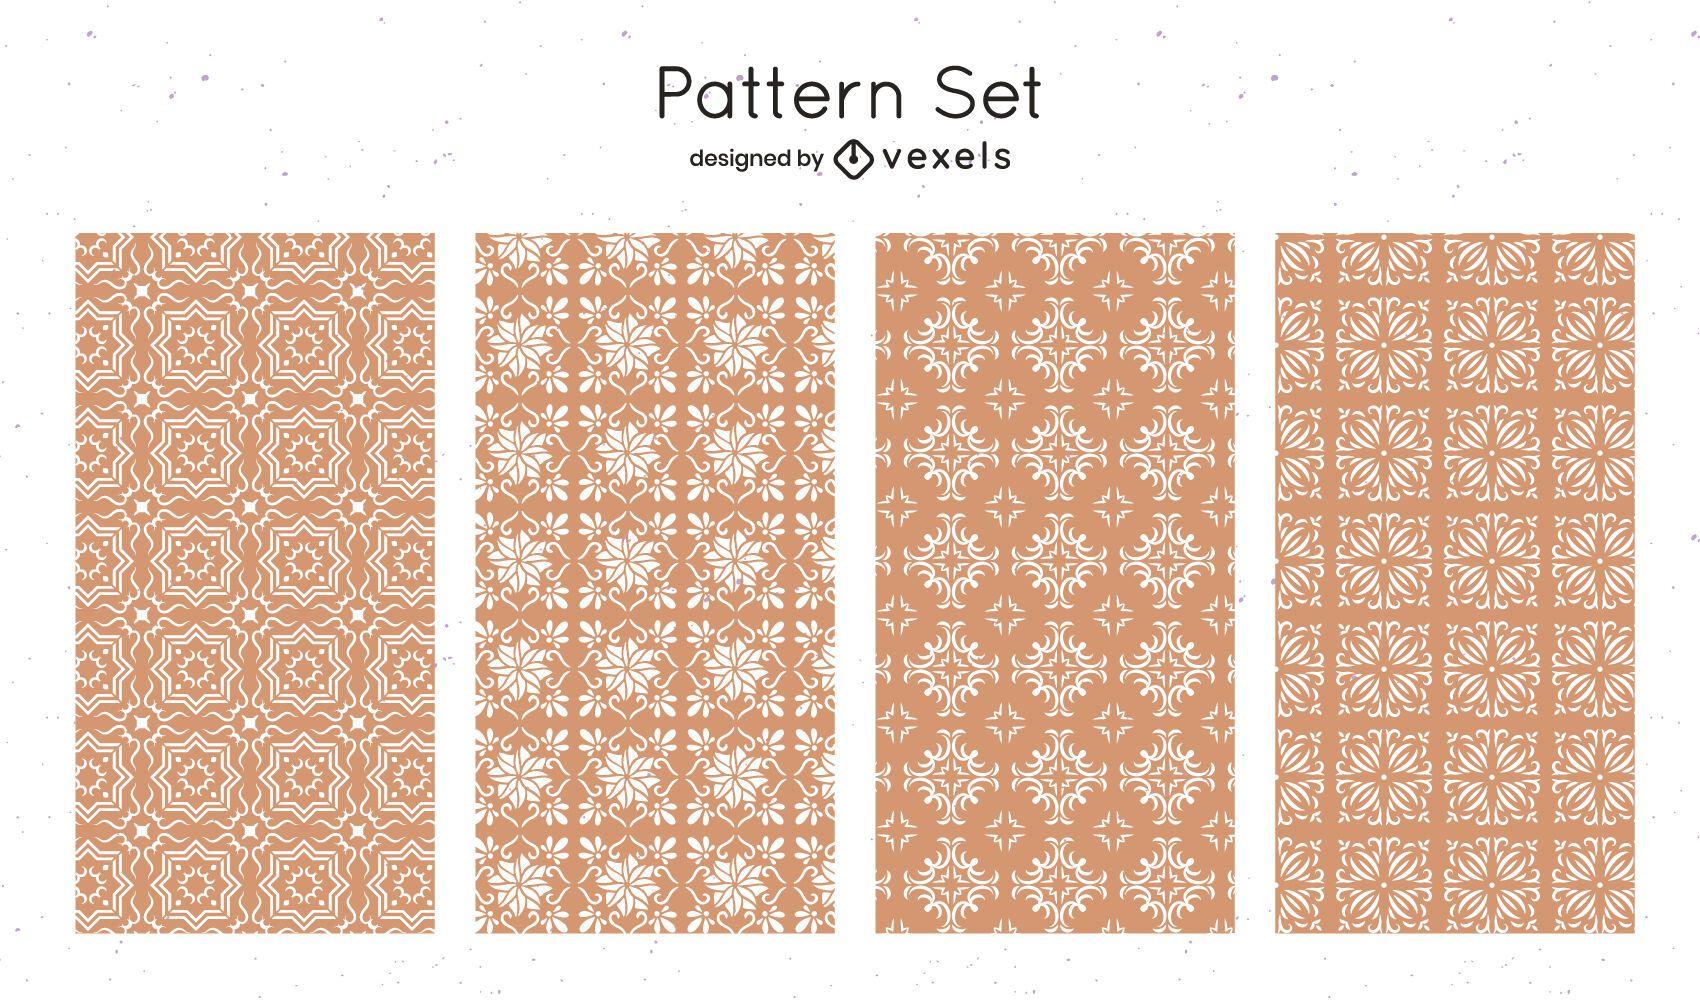 Geometric shapes pattern design